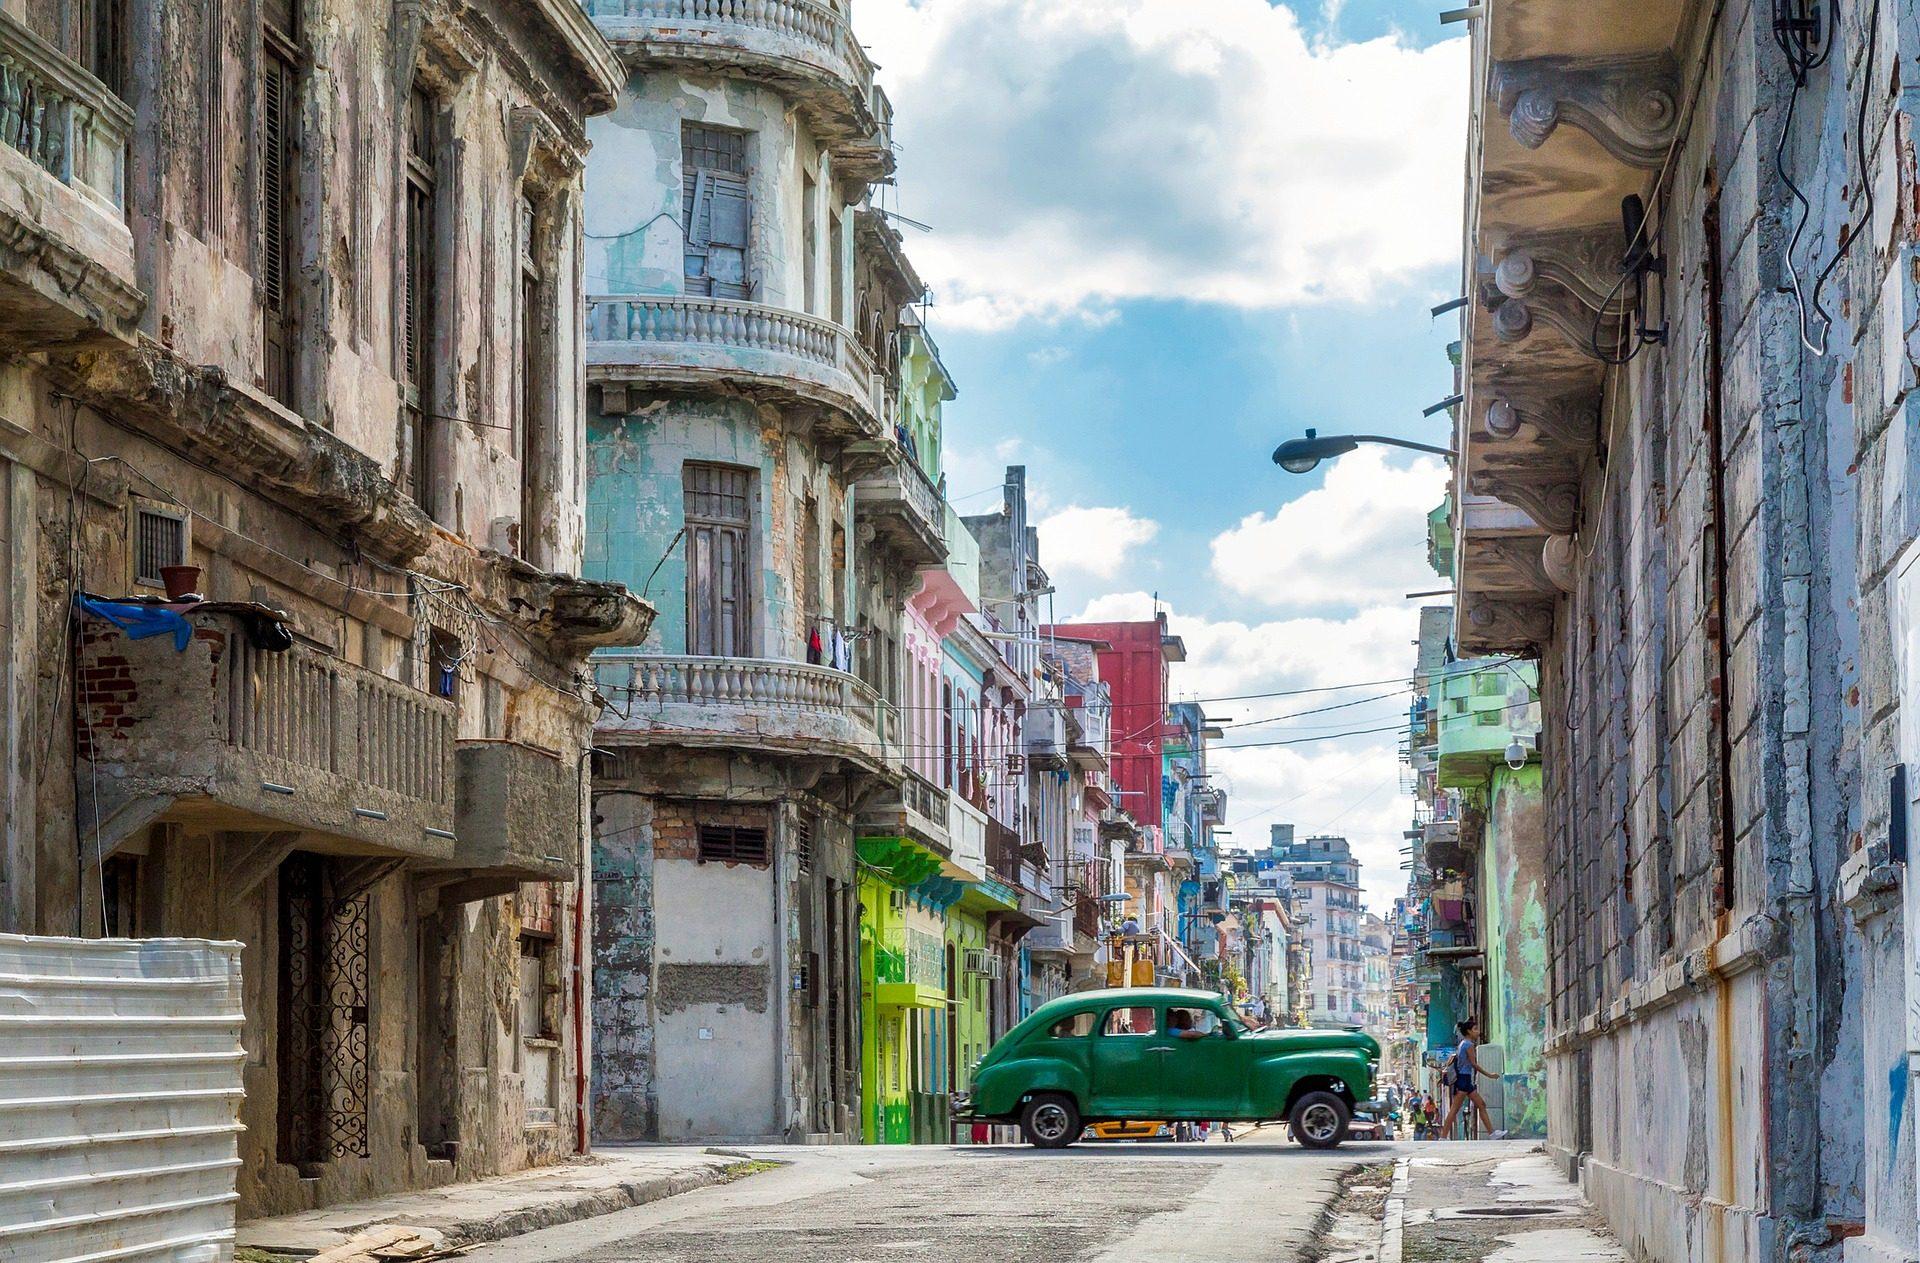 havana 1982410 1920 Tips to Follow when you Travel to Cuba